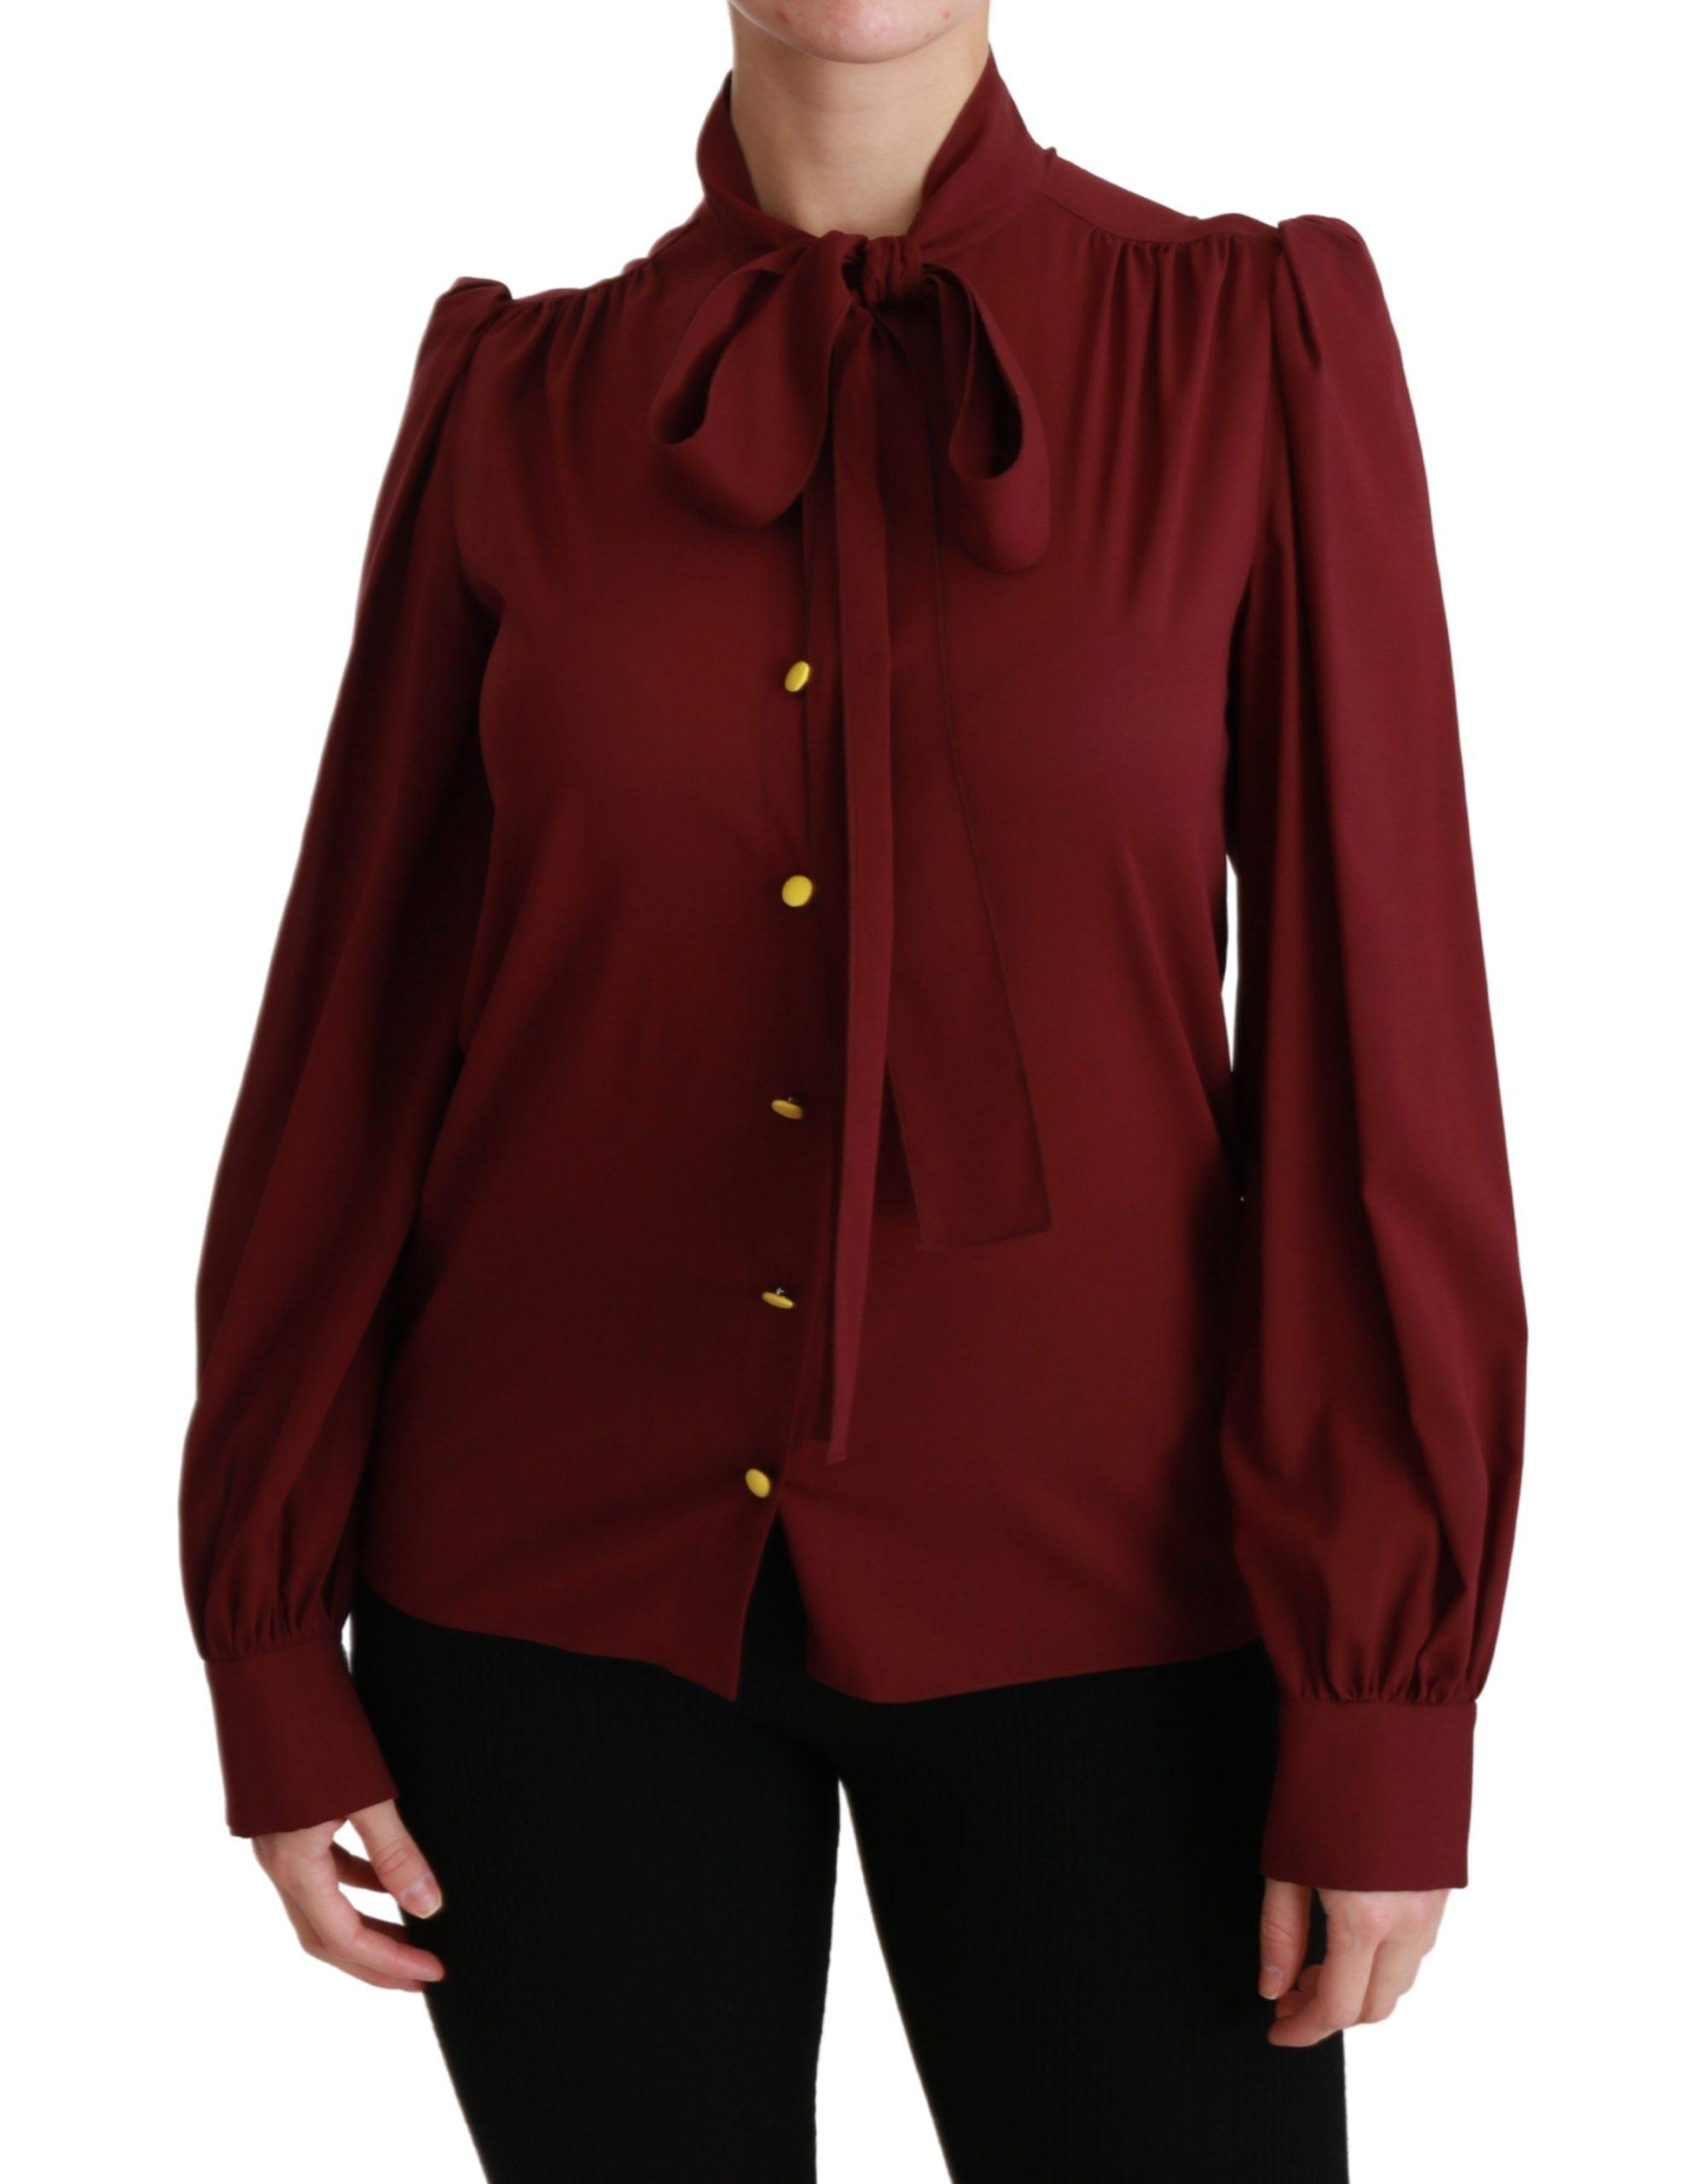 Dolce & Gabbana Women's LS Top Bordeaux TSH4470 - IT36 | XS